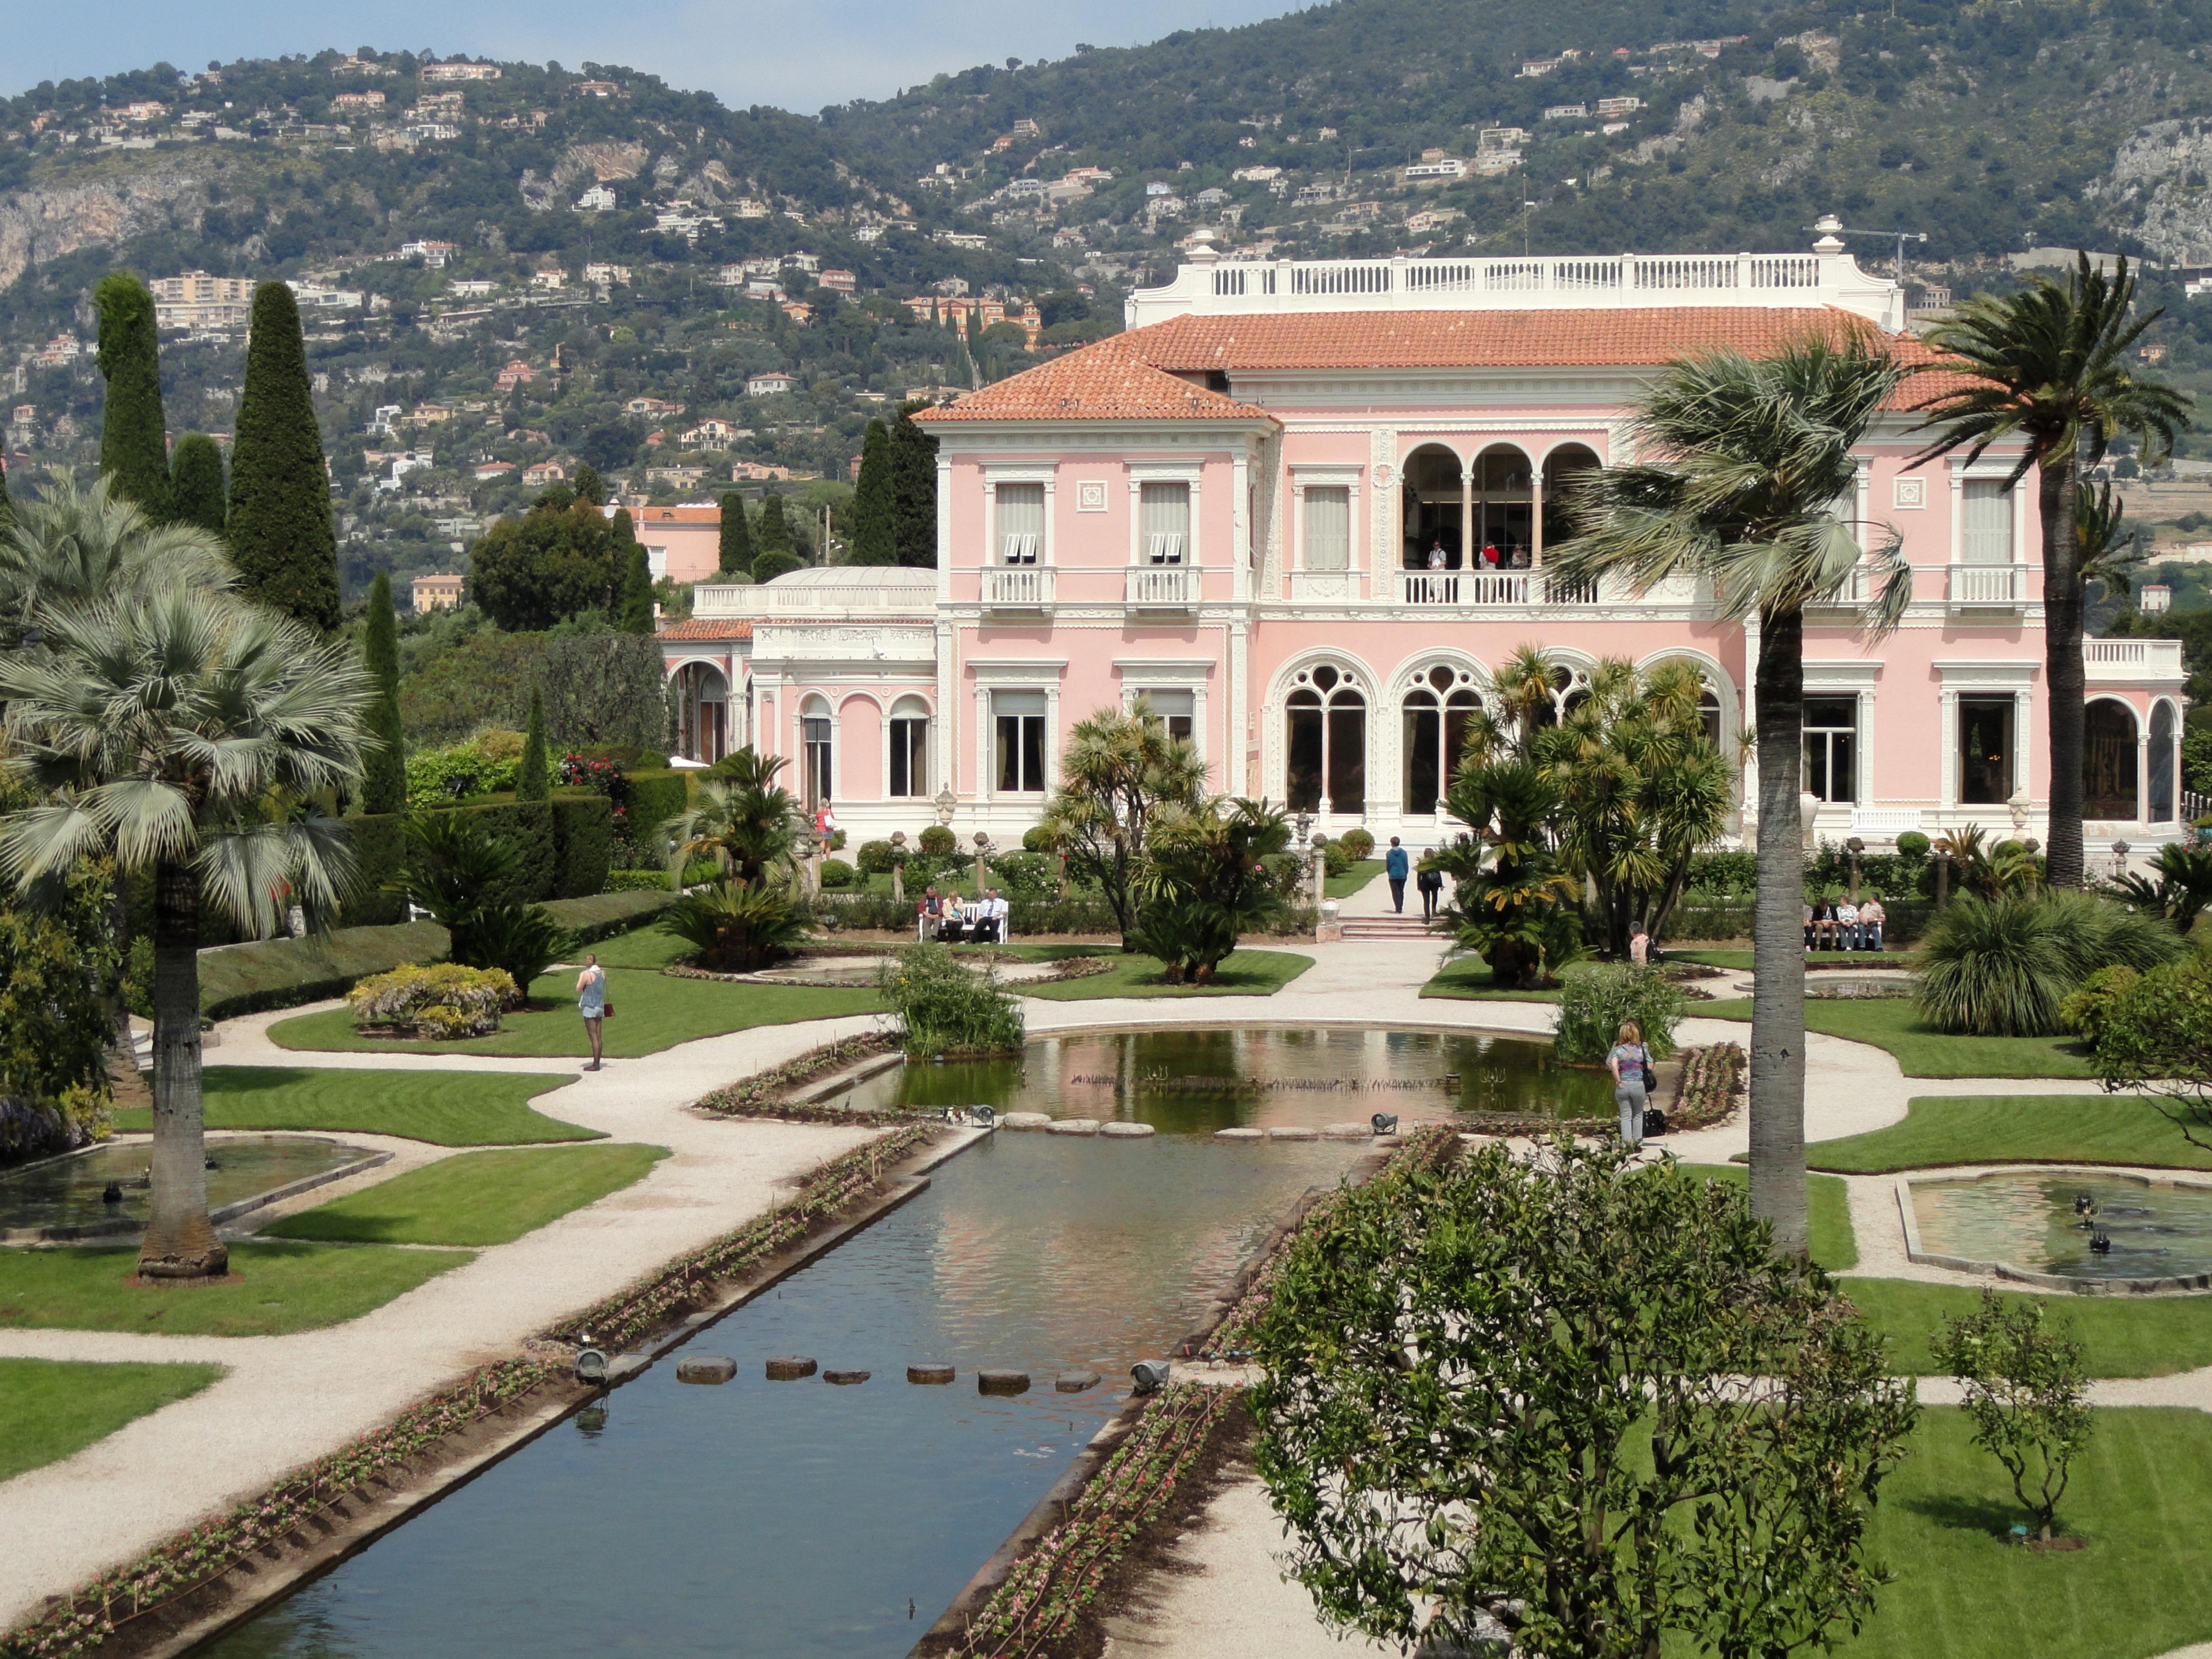 File:Villa Ephrussi de Rothschild - DSC04748.JPG - Wikimedia ...